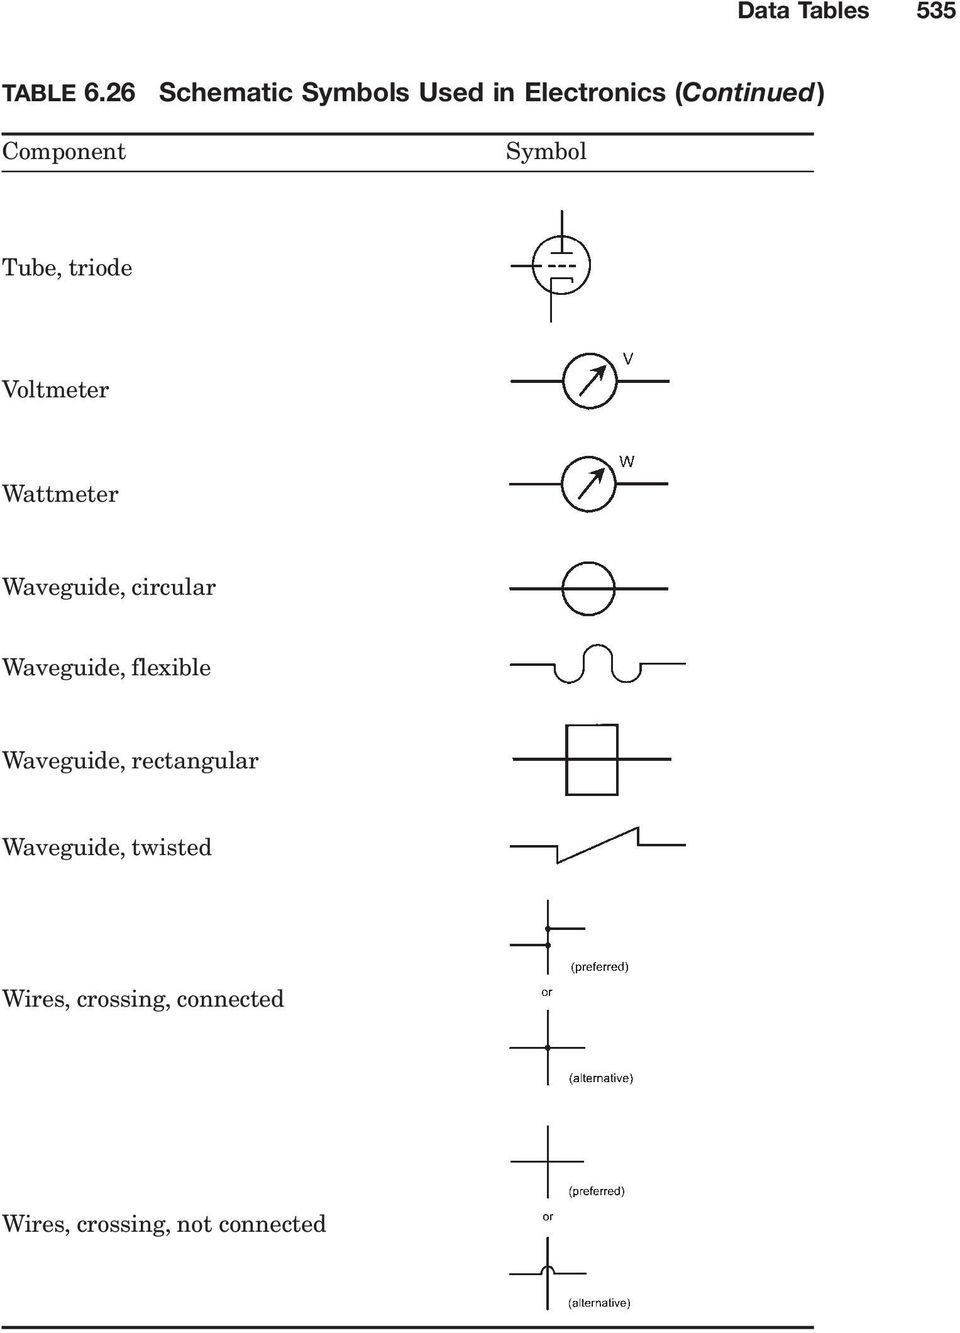 hight resolution of circular waveguide flexible waveguide rectangular